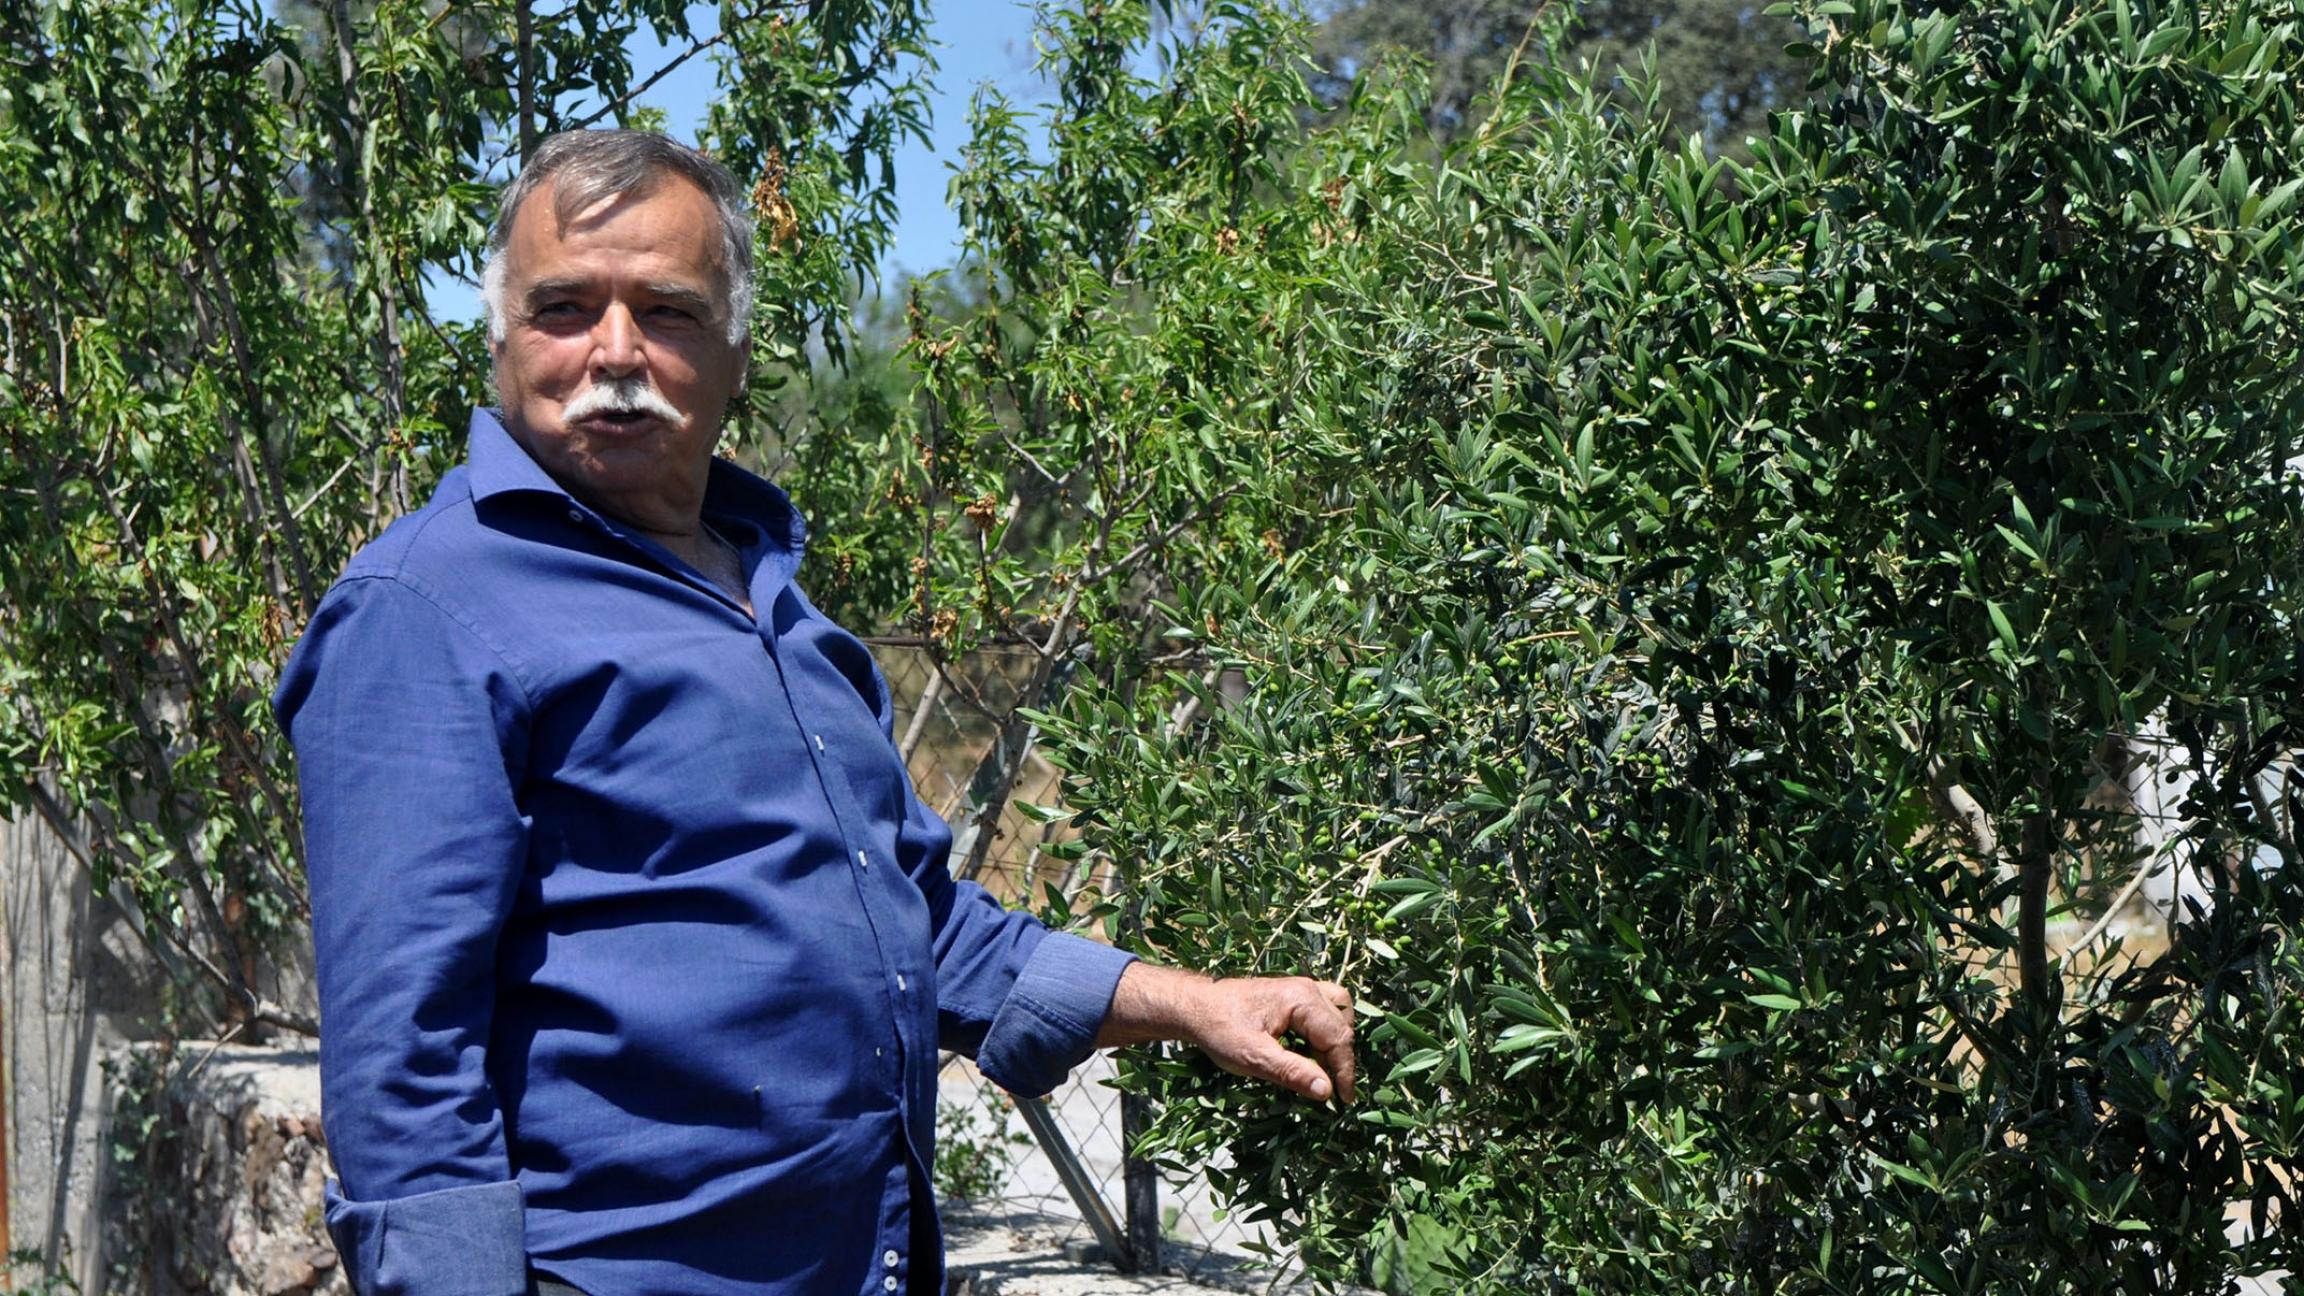 Huseyin Kara shows off his lush green olive trees, like a proud grandfather.